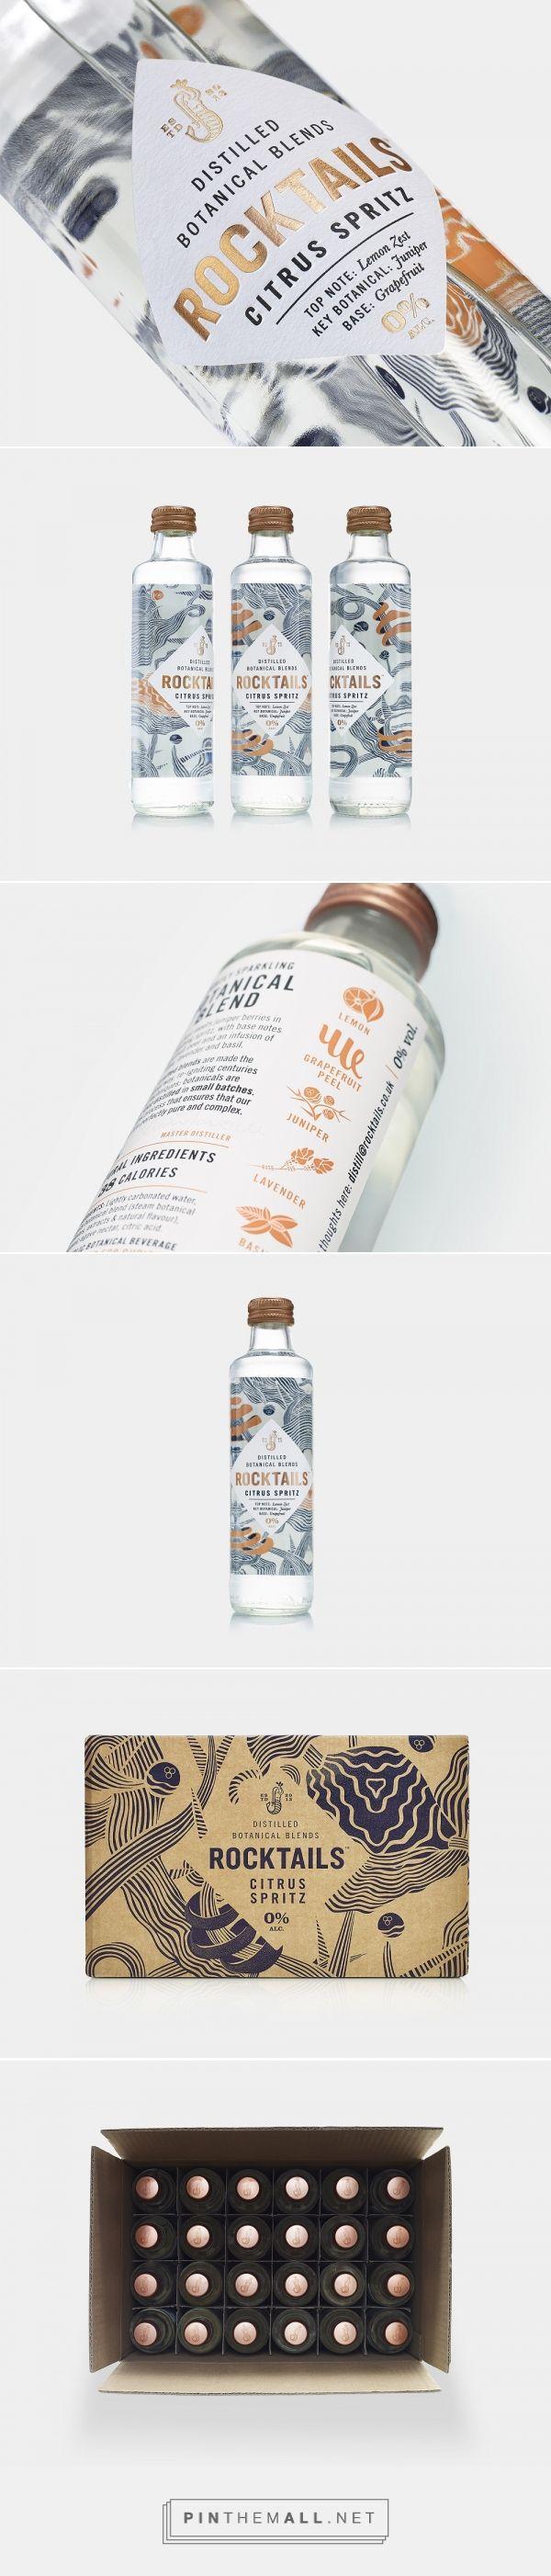 ROCKTAILS Botanical Blends Packaging Design Europe Packages And - 30 genius packaging designs